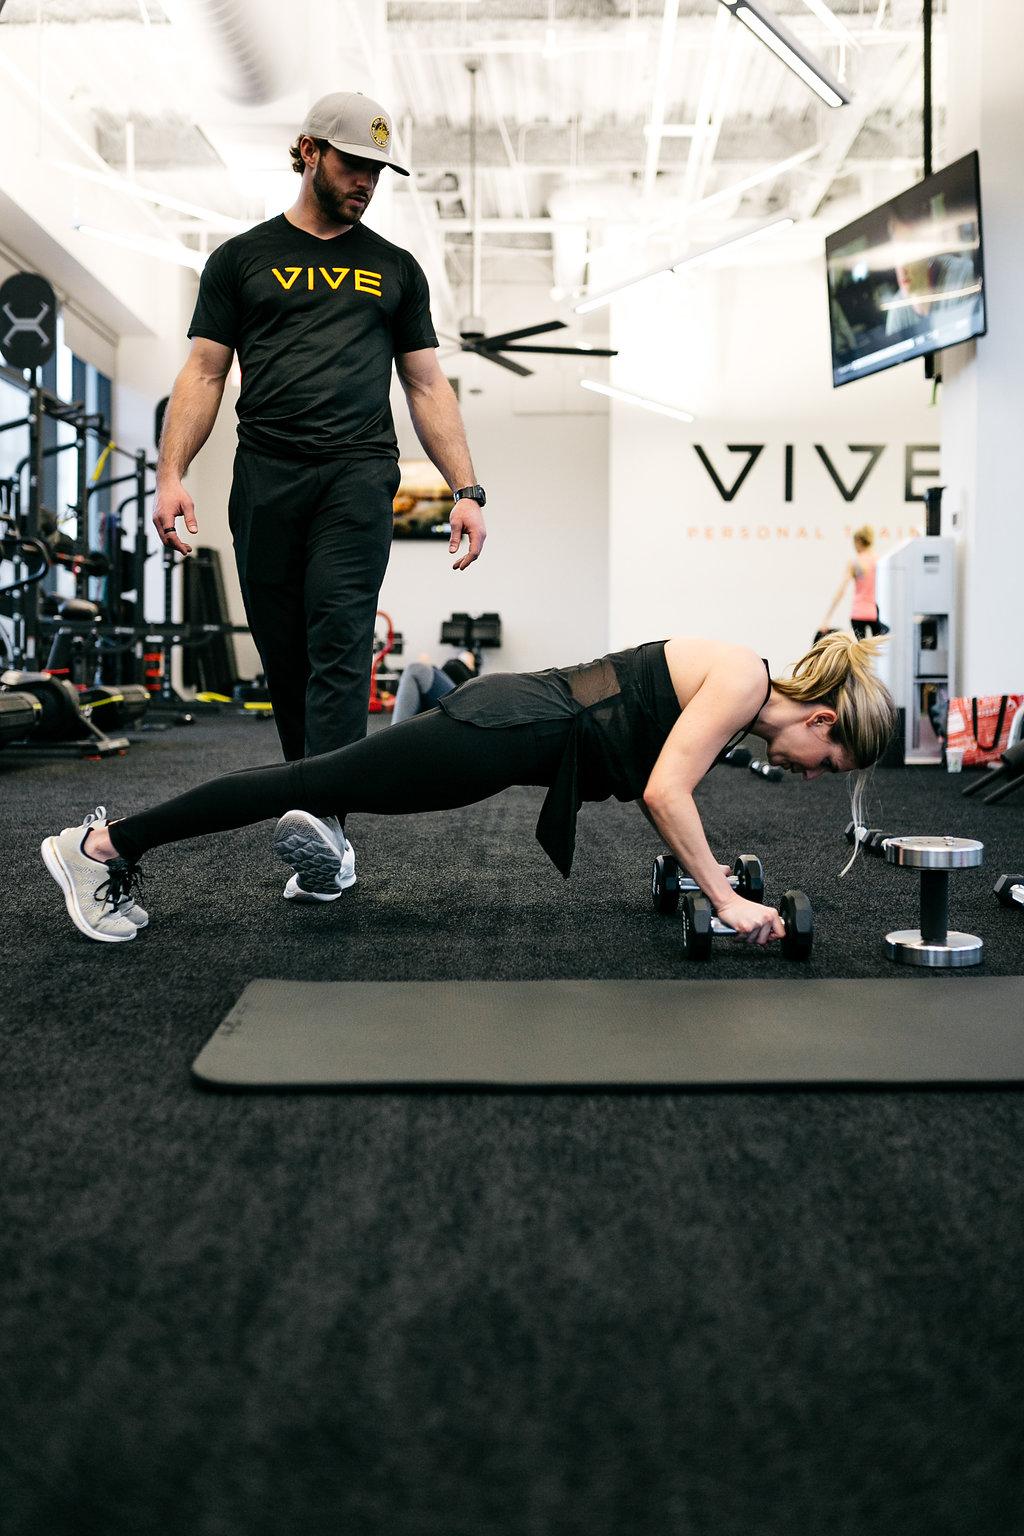 Dallas fitness trainers